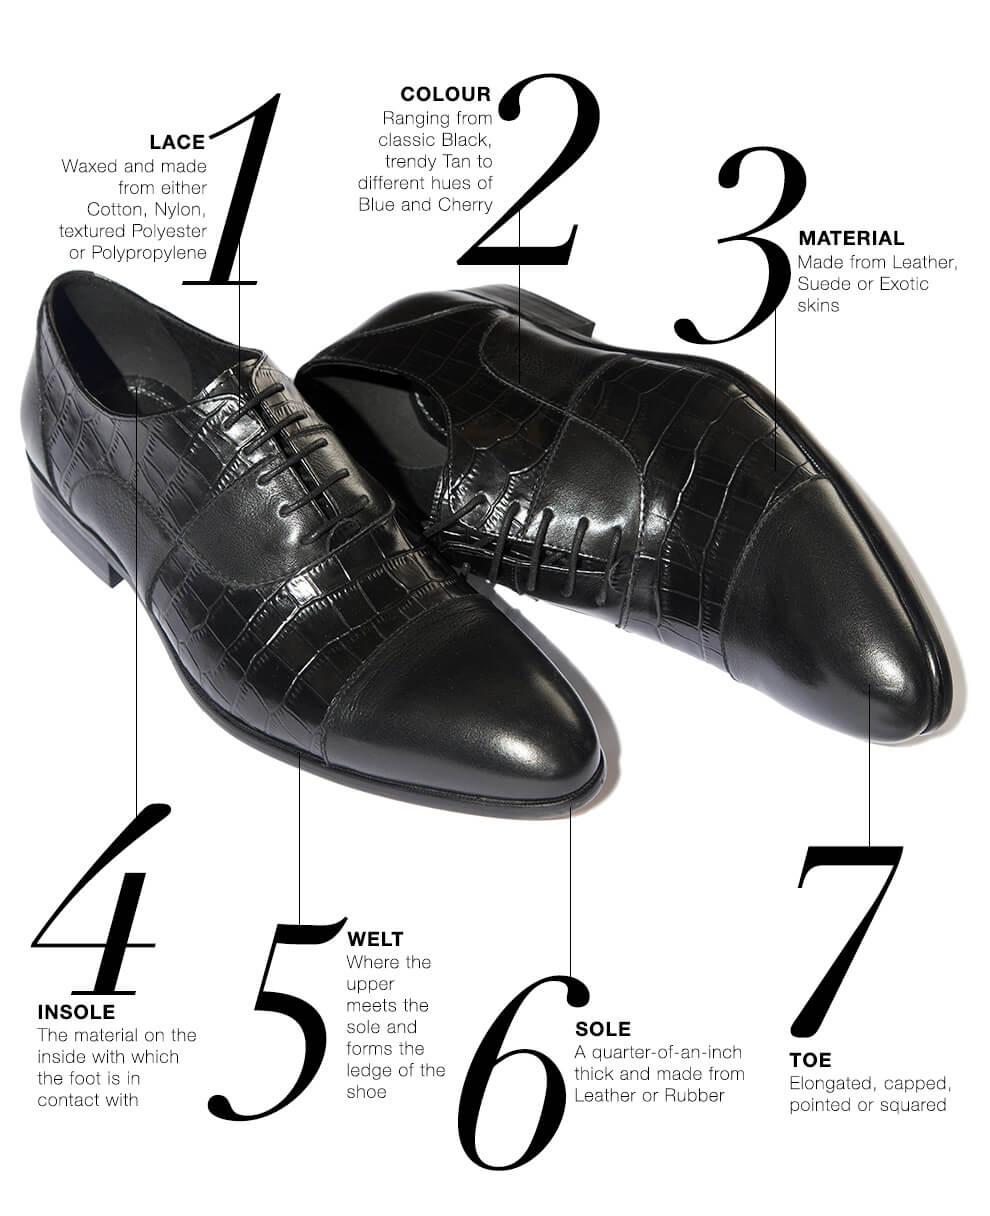 e7d73334232 Amazon.in  Buying Guide  Men s Formal Shoes  Shoes   Handbags